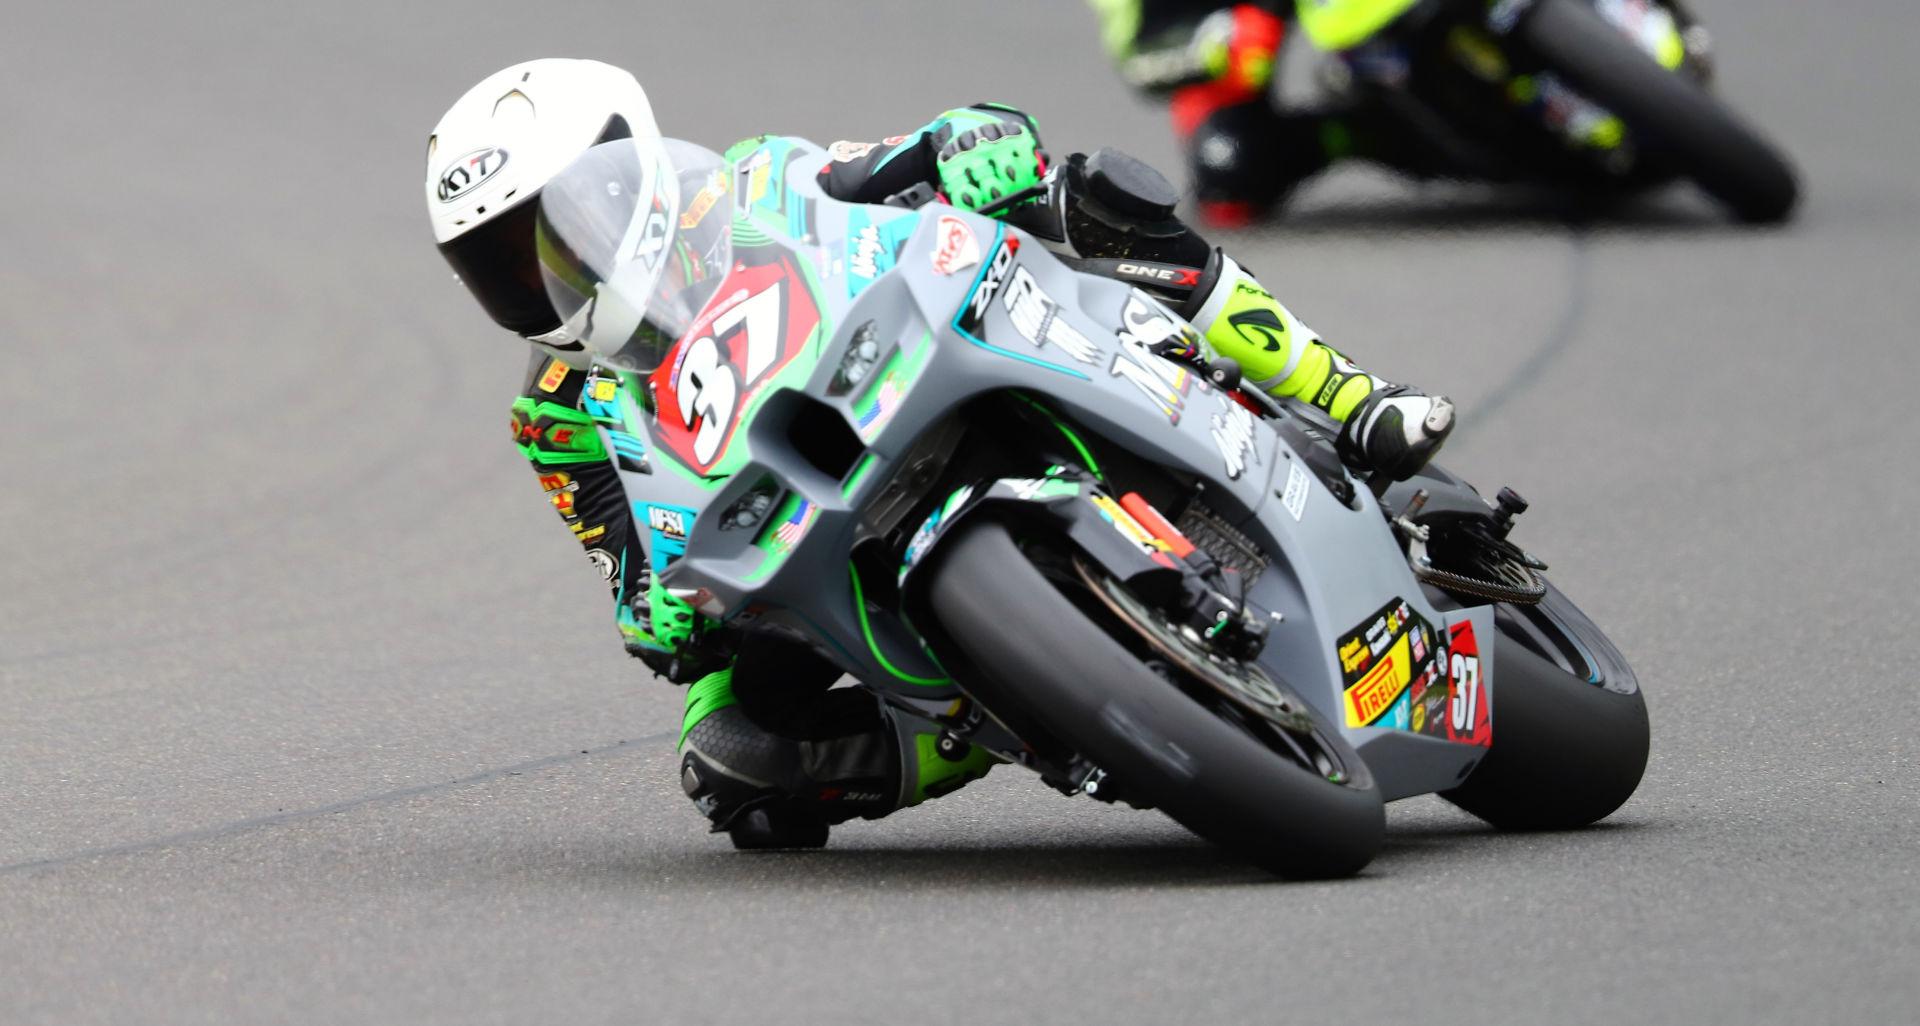 Stefano Mesa (37). Photo by etechphoto.com, courtesy Pirelli.